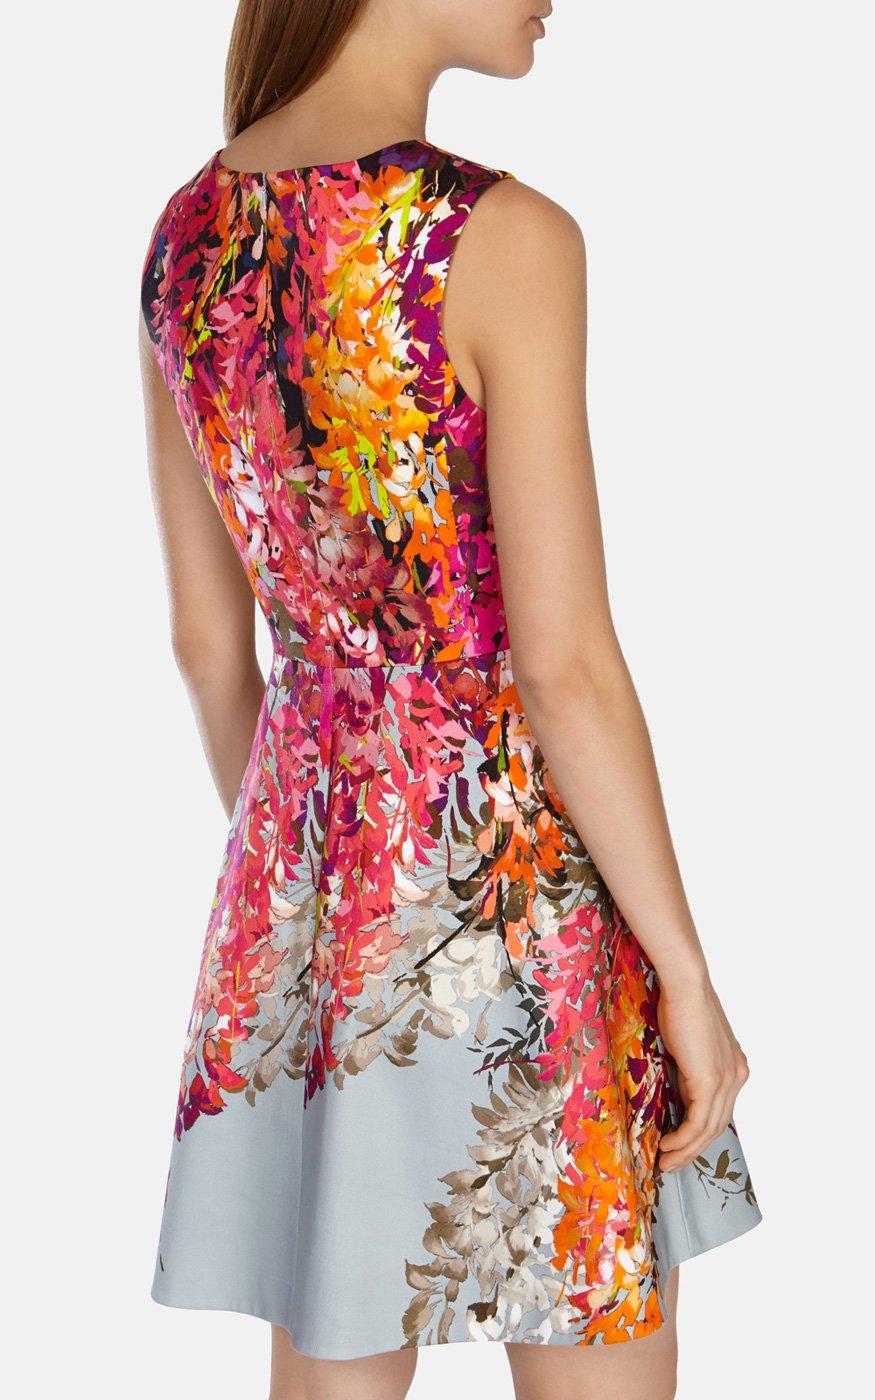 486da2beced Karen Millen Oriental Floral Print Fit And Flare Dress - Lyst